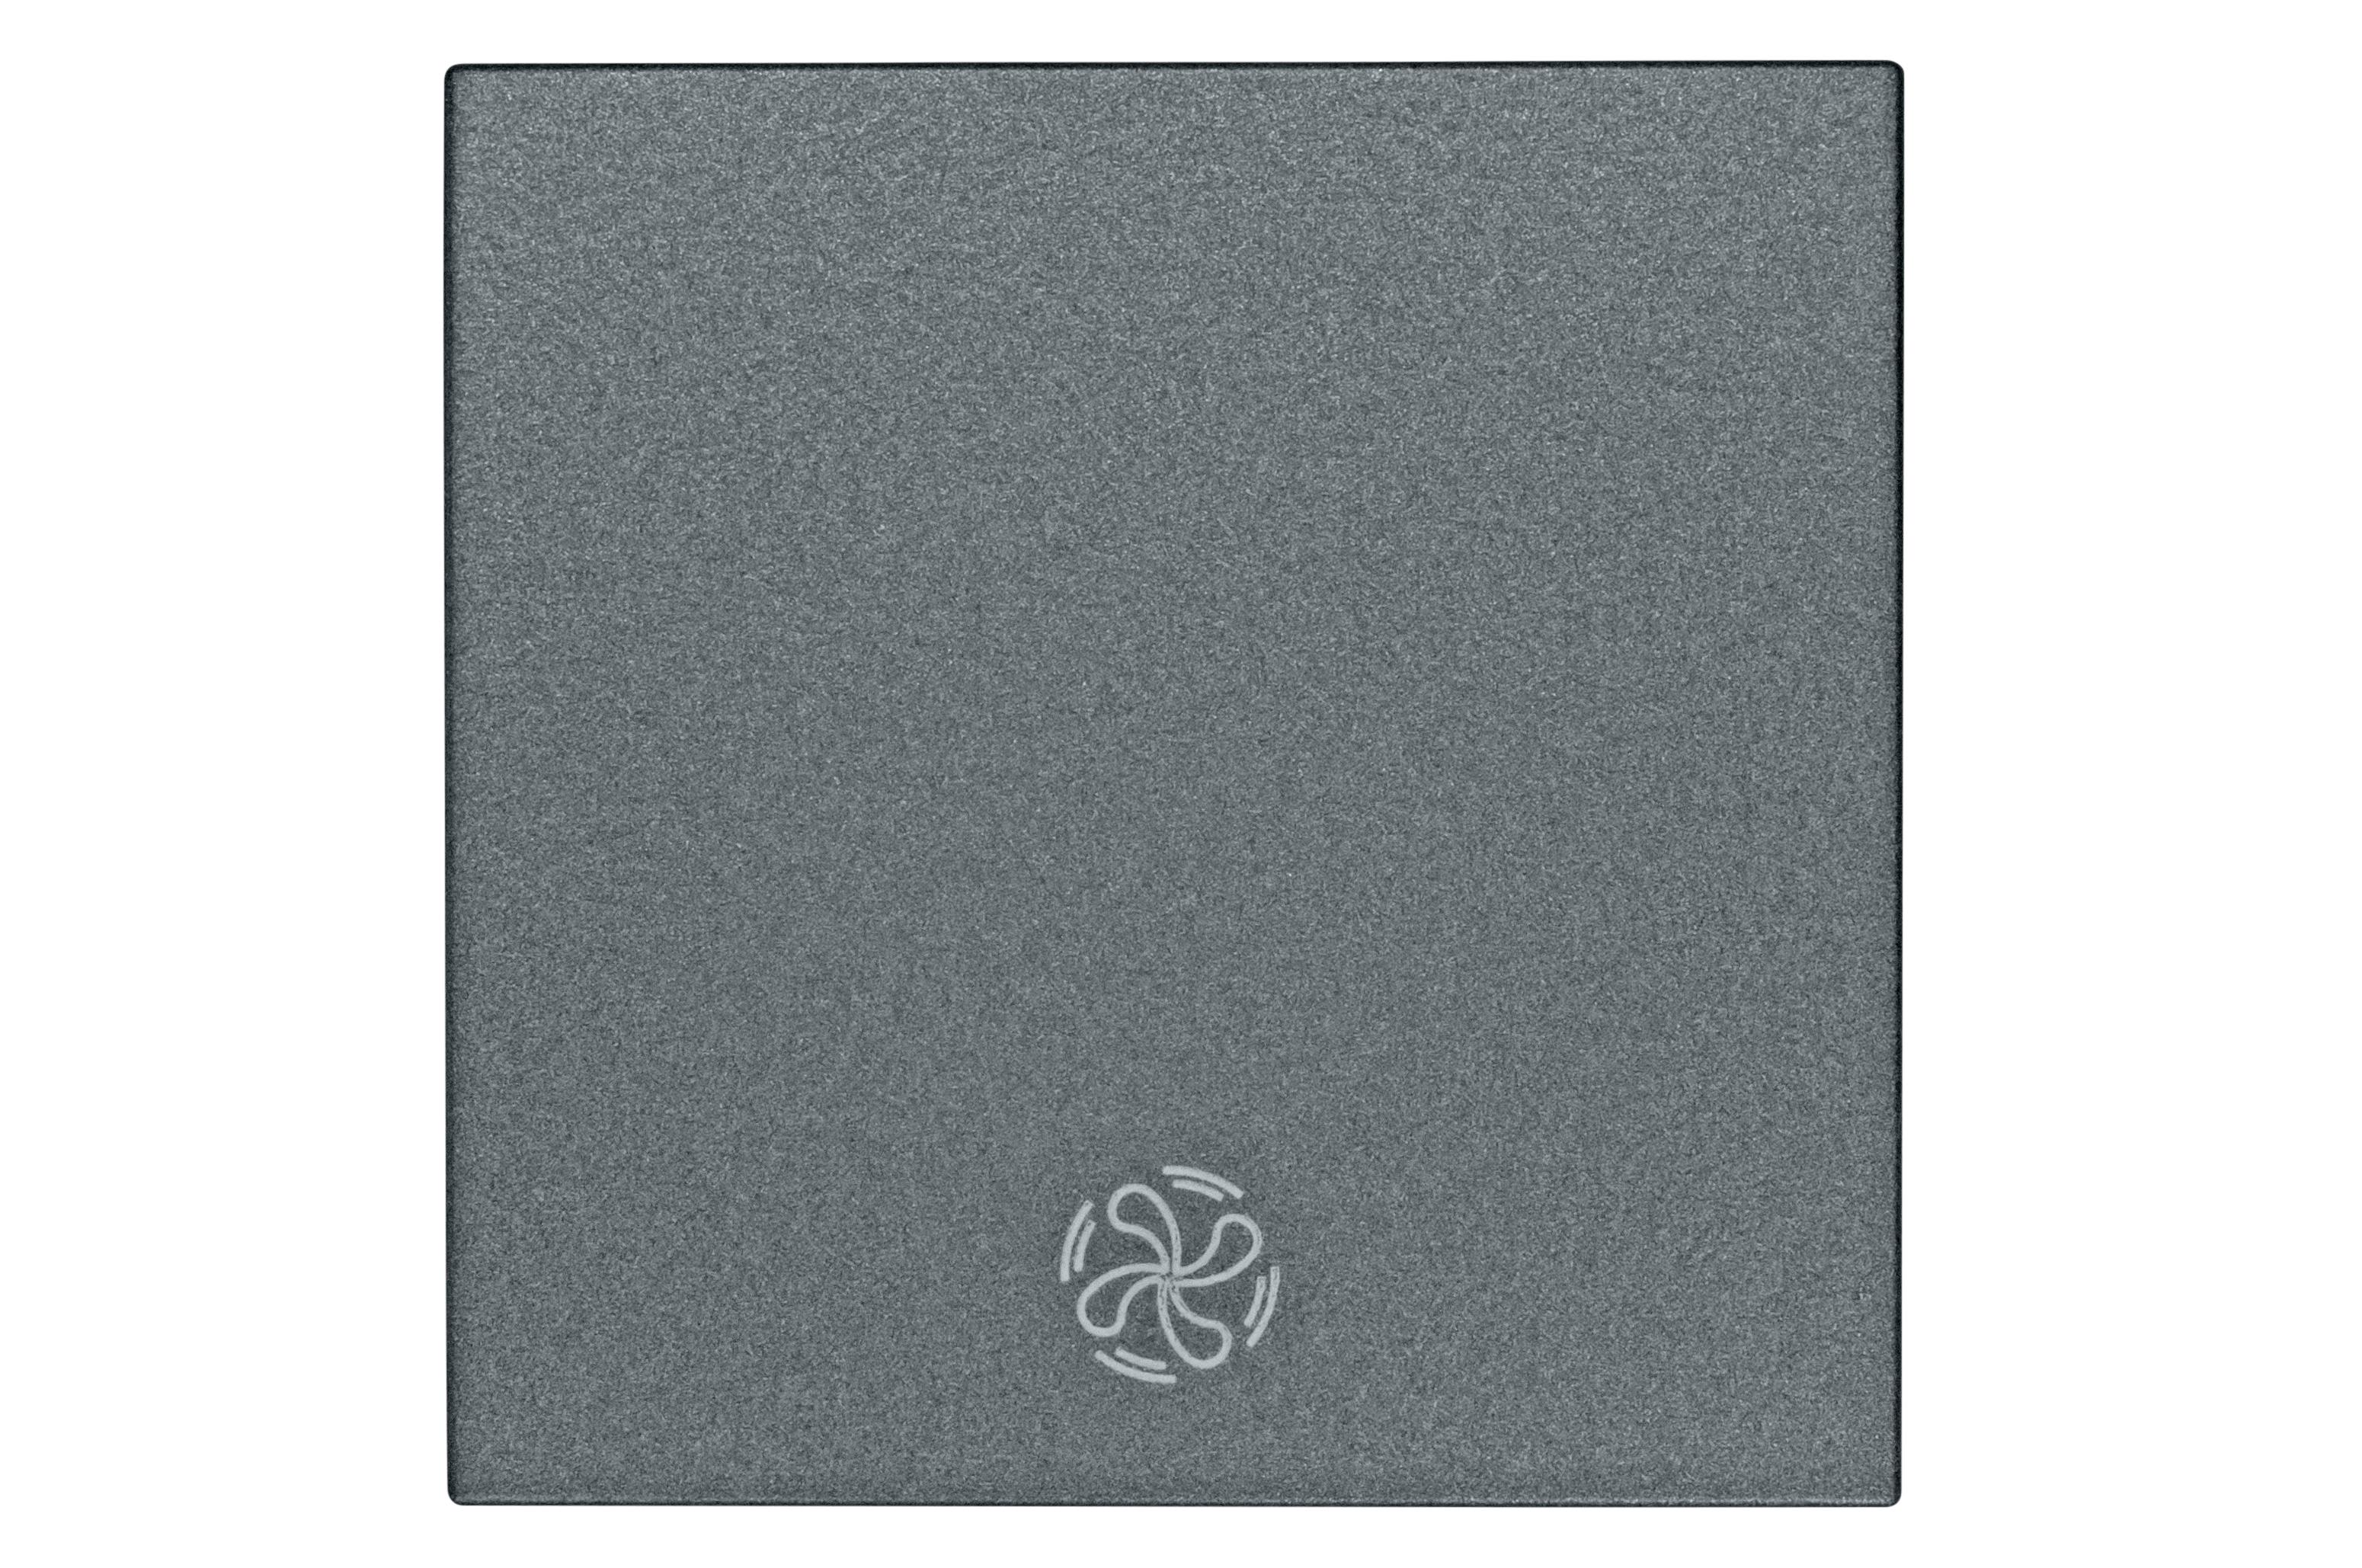 1 Stk Wippe mit Symbol Lüfter, anthrazit EV112006--